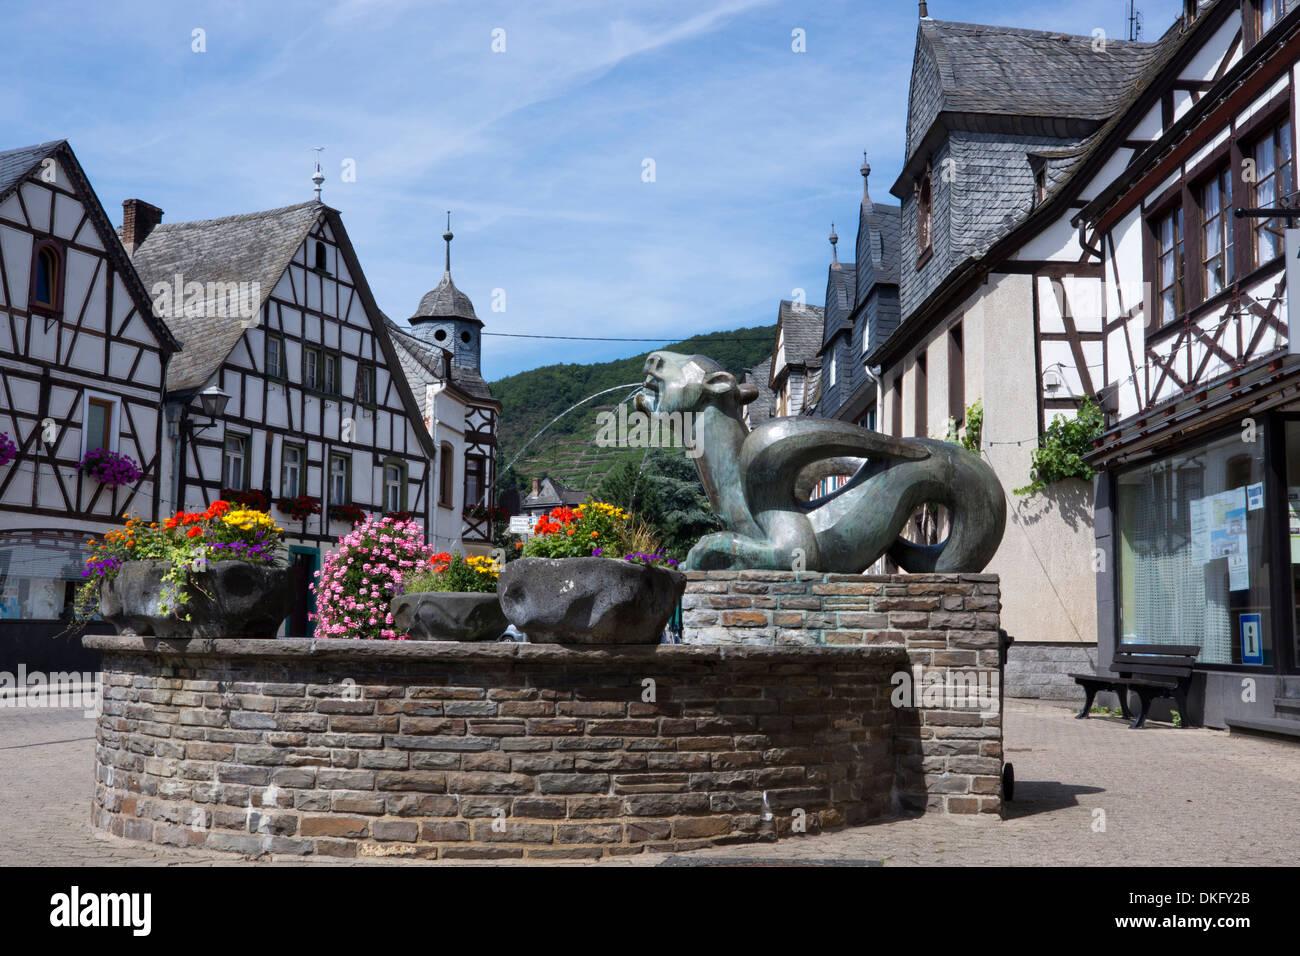 tatzelwurm weinbrunnen fountain in kobern village, kobern-gondorf village, moselle region, rhineland-palatinate, - Stock Image